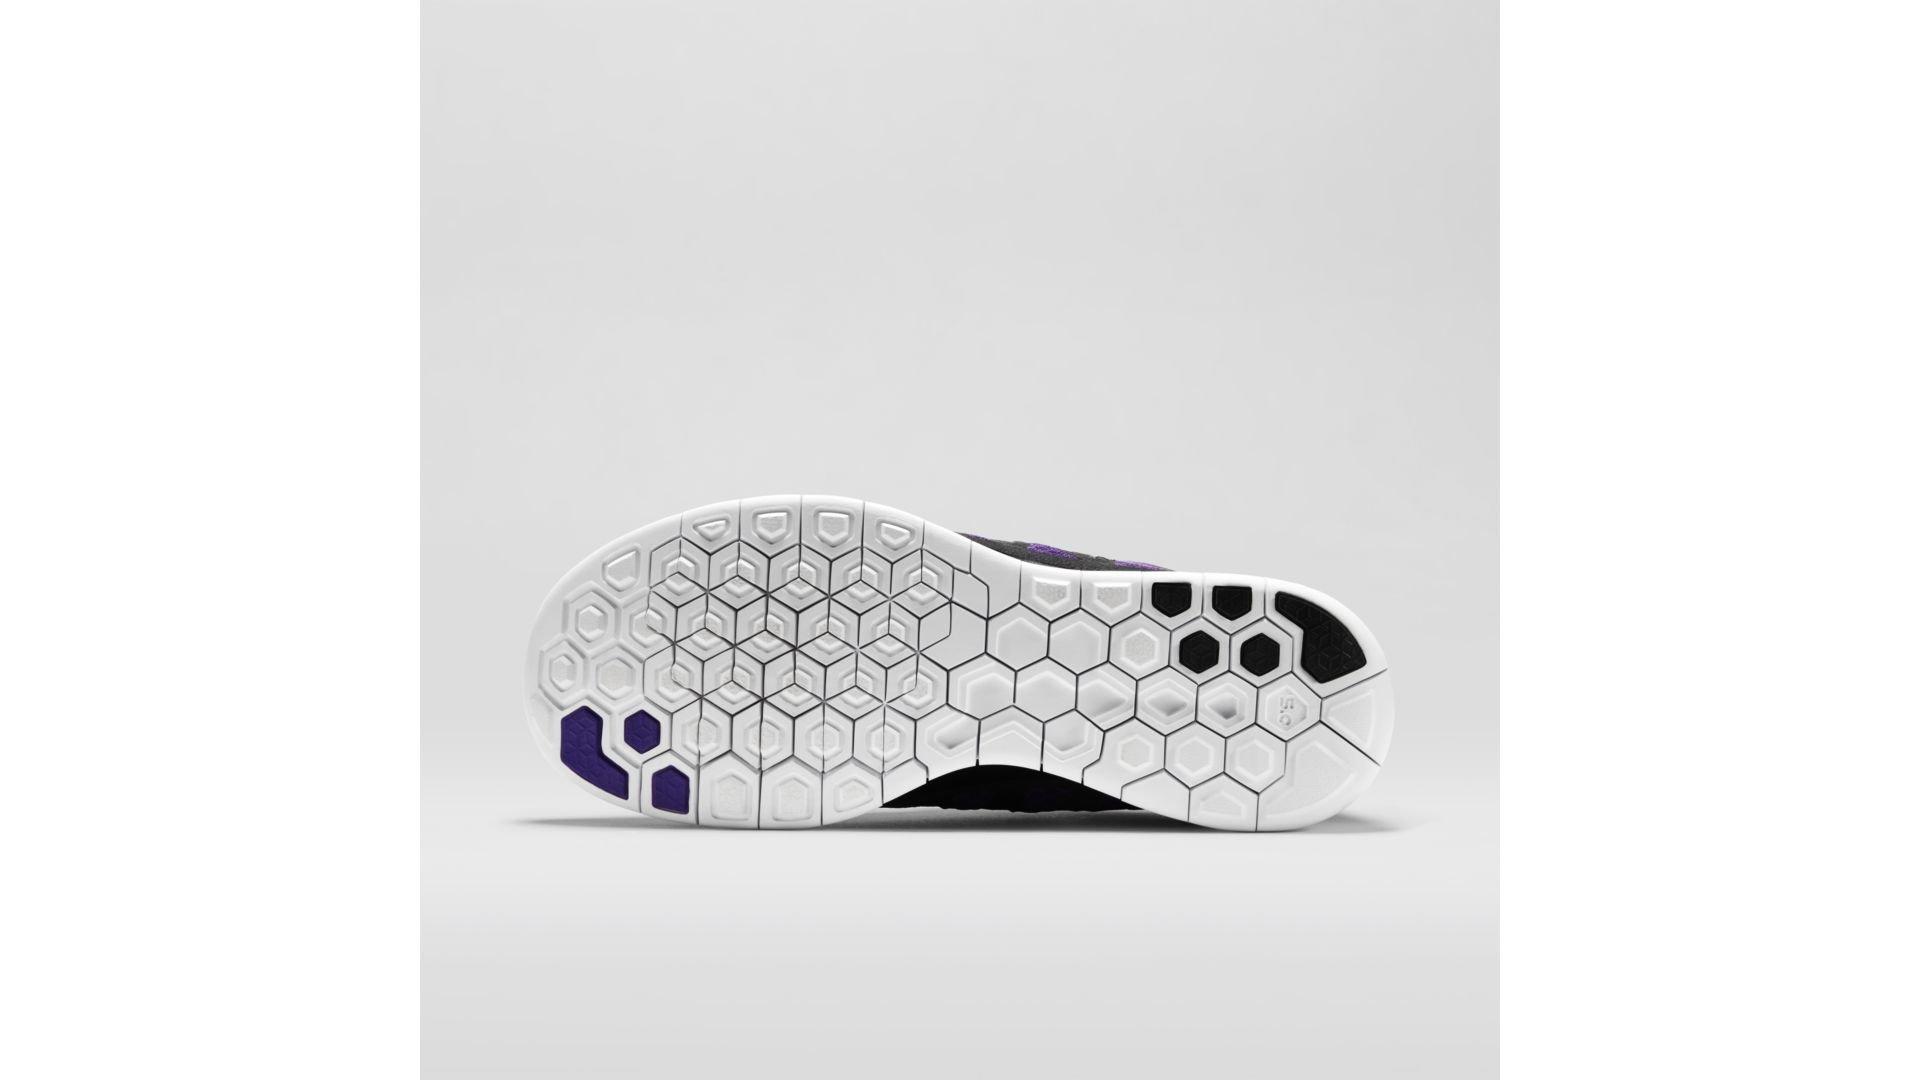 Nike Free 5.0 Doernbecher (2014) (725566-580)